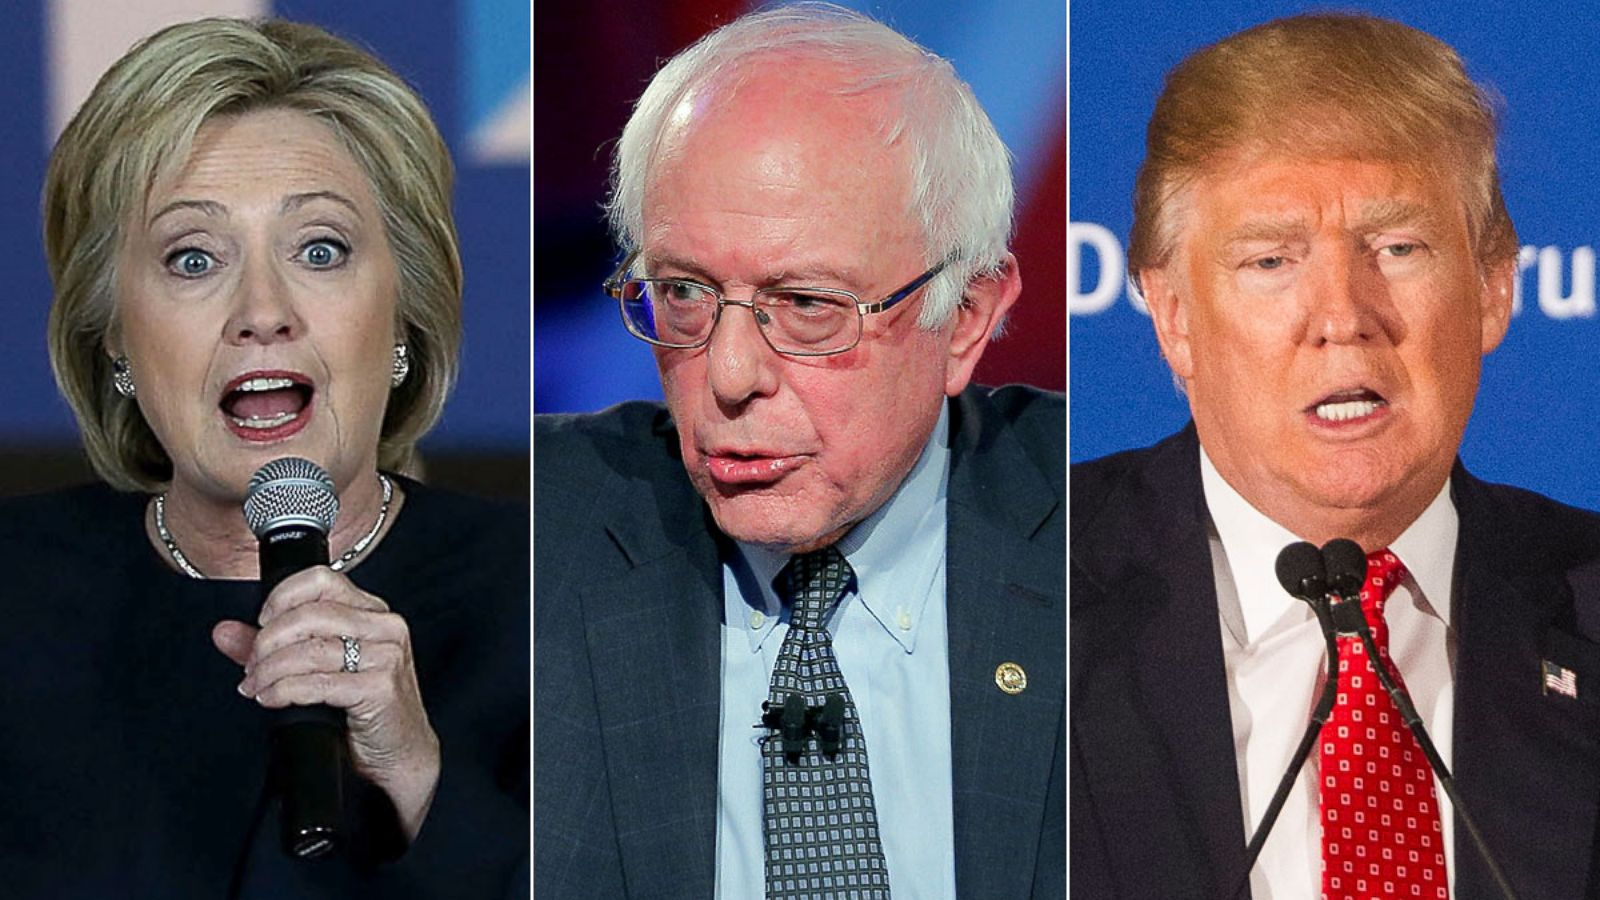 This Week' Transcript: Hillary Clinton, Sen. Bernie Sanders and Donald Trump  - ABC News